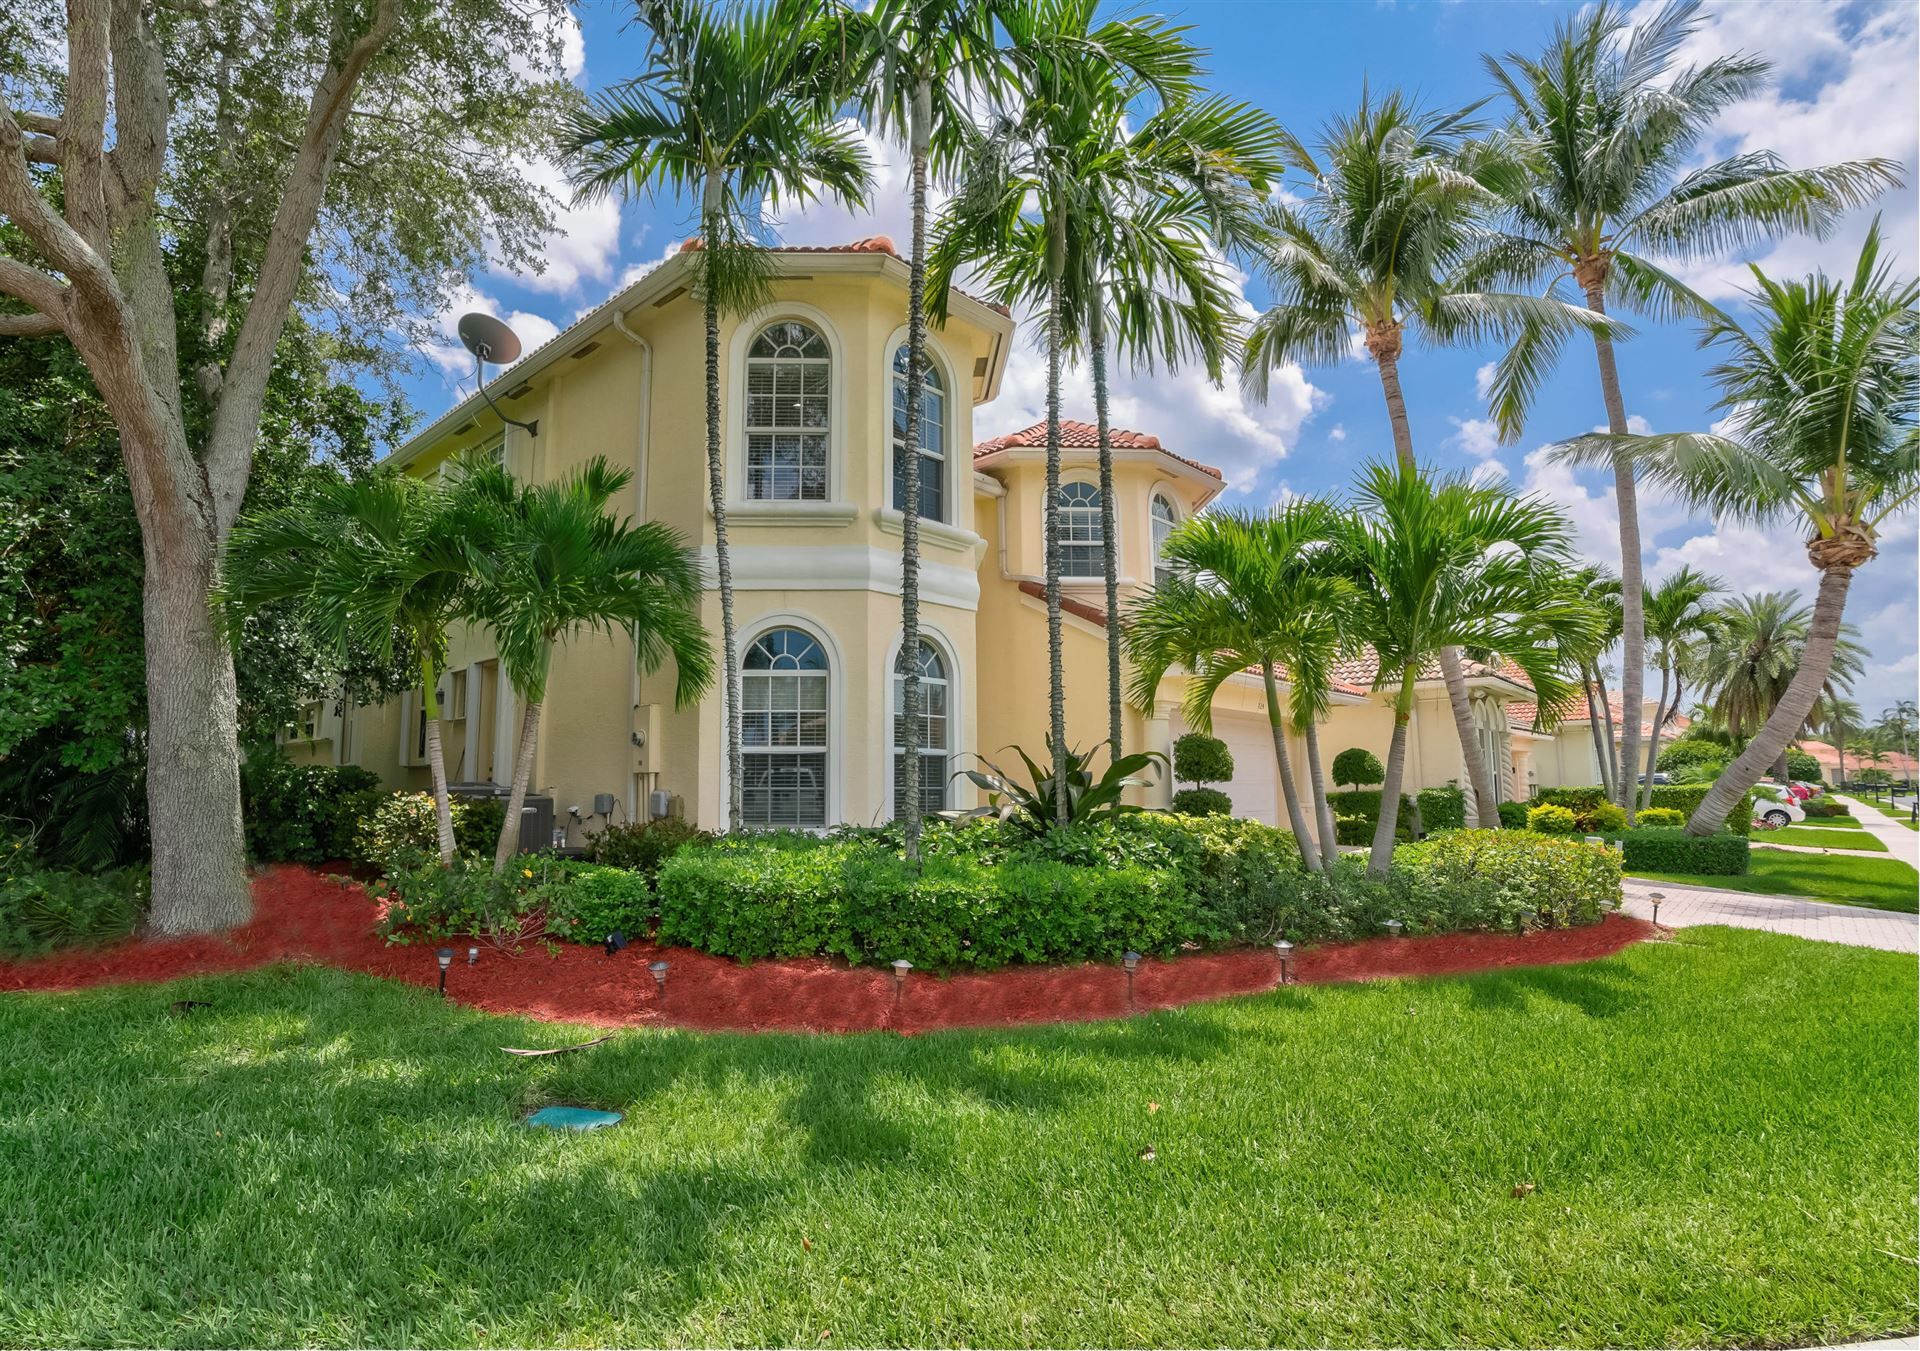 724 Maritime Way, Palm Beach Gardens, FL 33410 - MLS#: RX-10728270